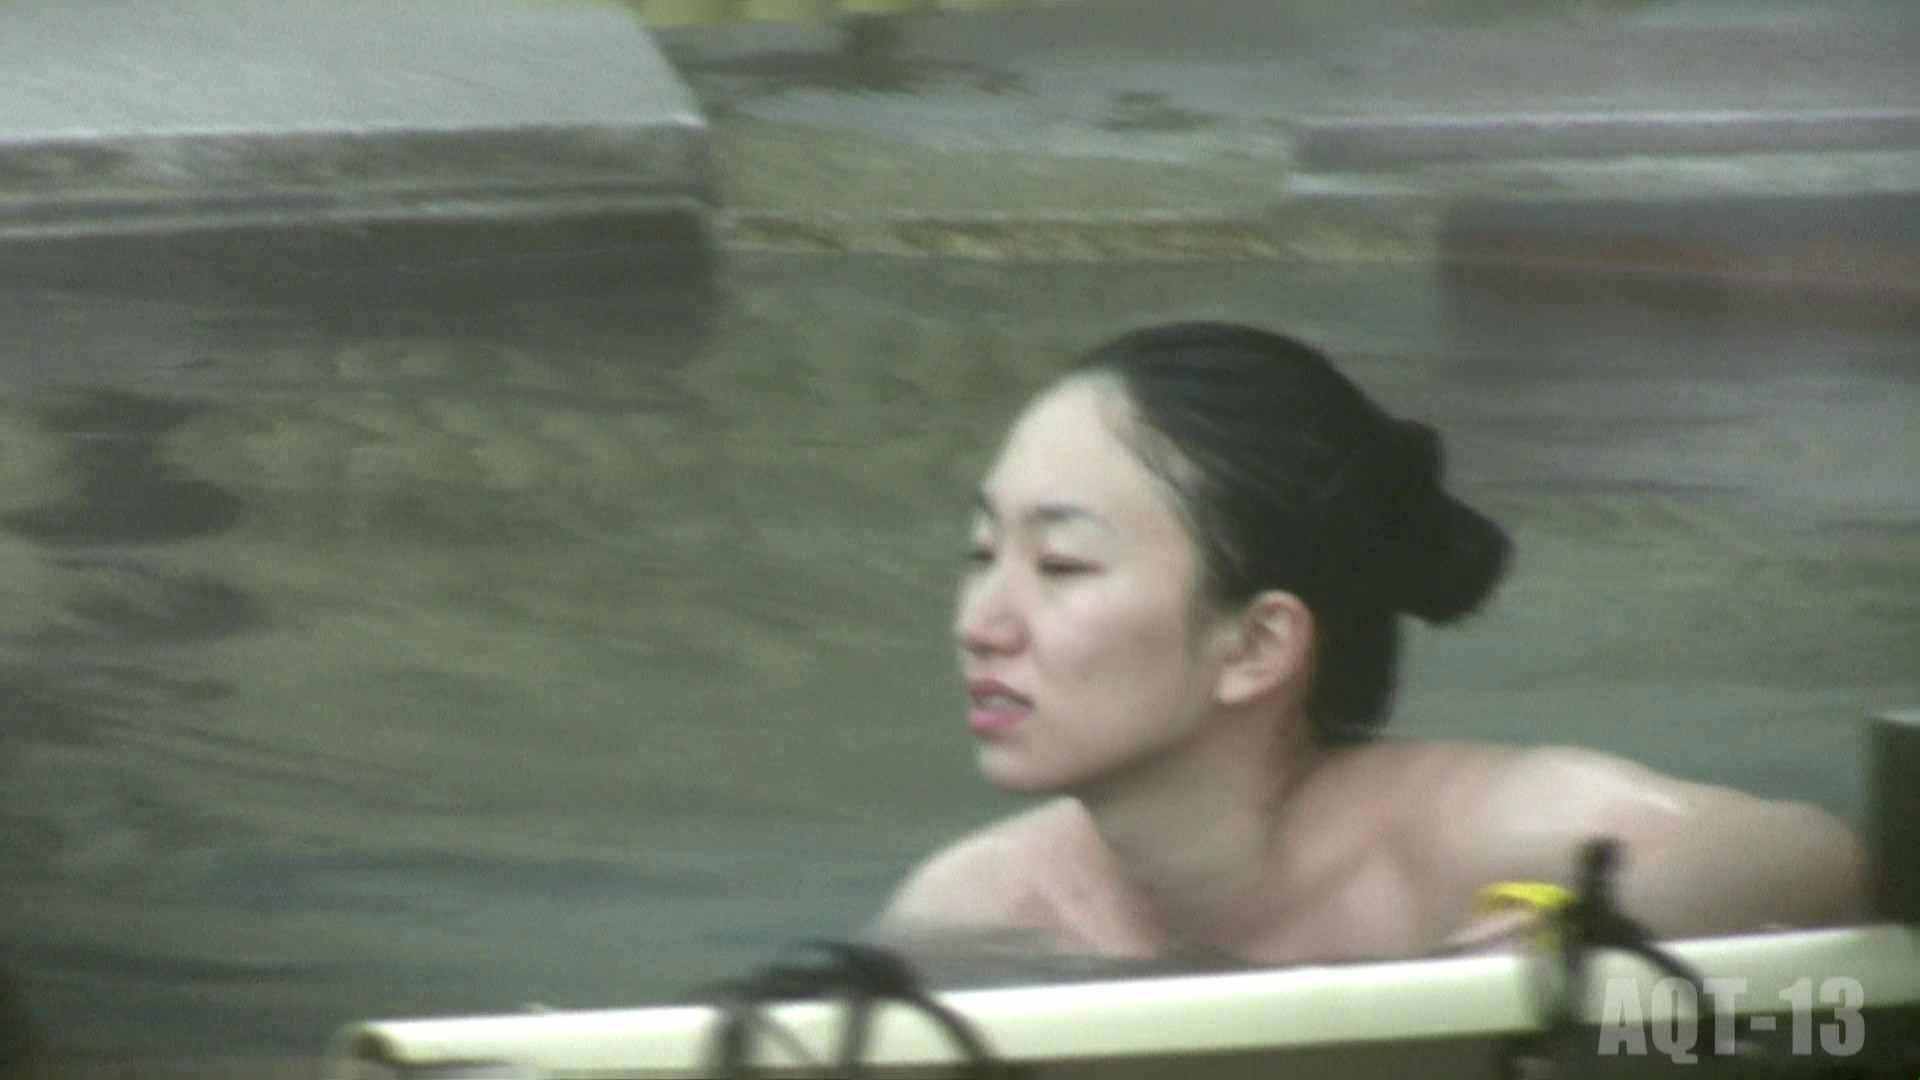 Aquaな露天風呂Vol.818 OLセックス | 露天  88画像 1